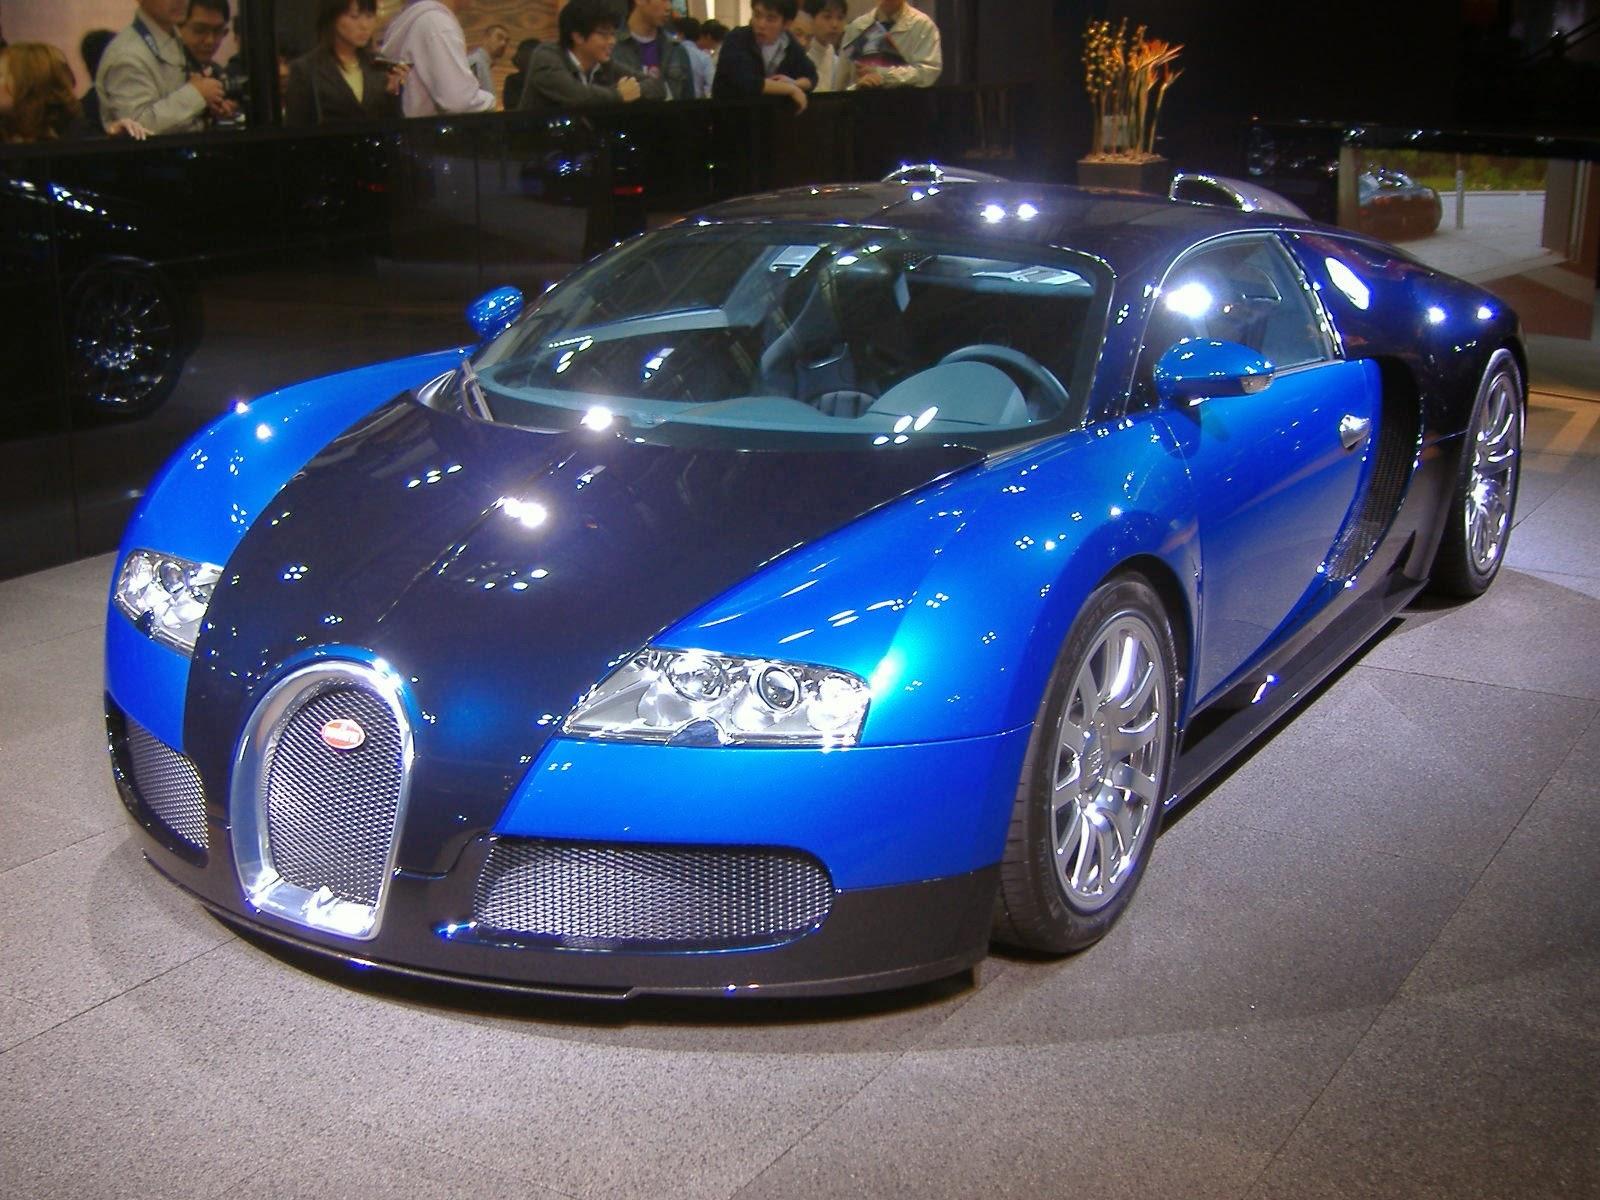 Bugatti Veyron Wallpapers Hd Wallpapers